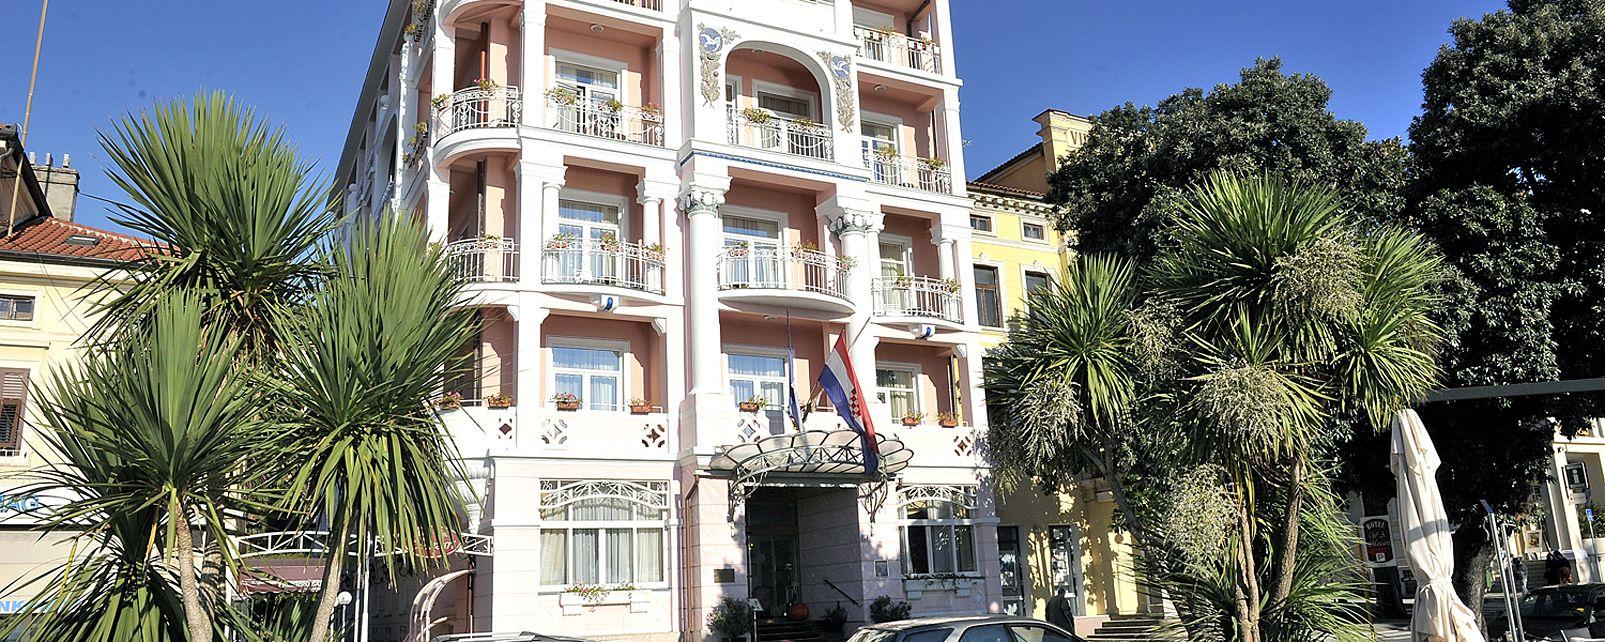 Hôtel Mozart